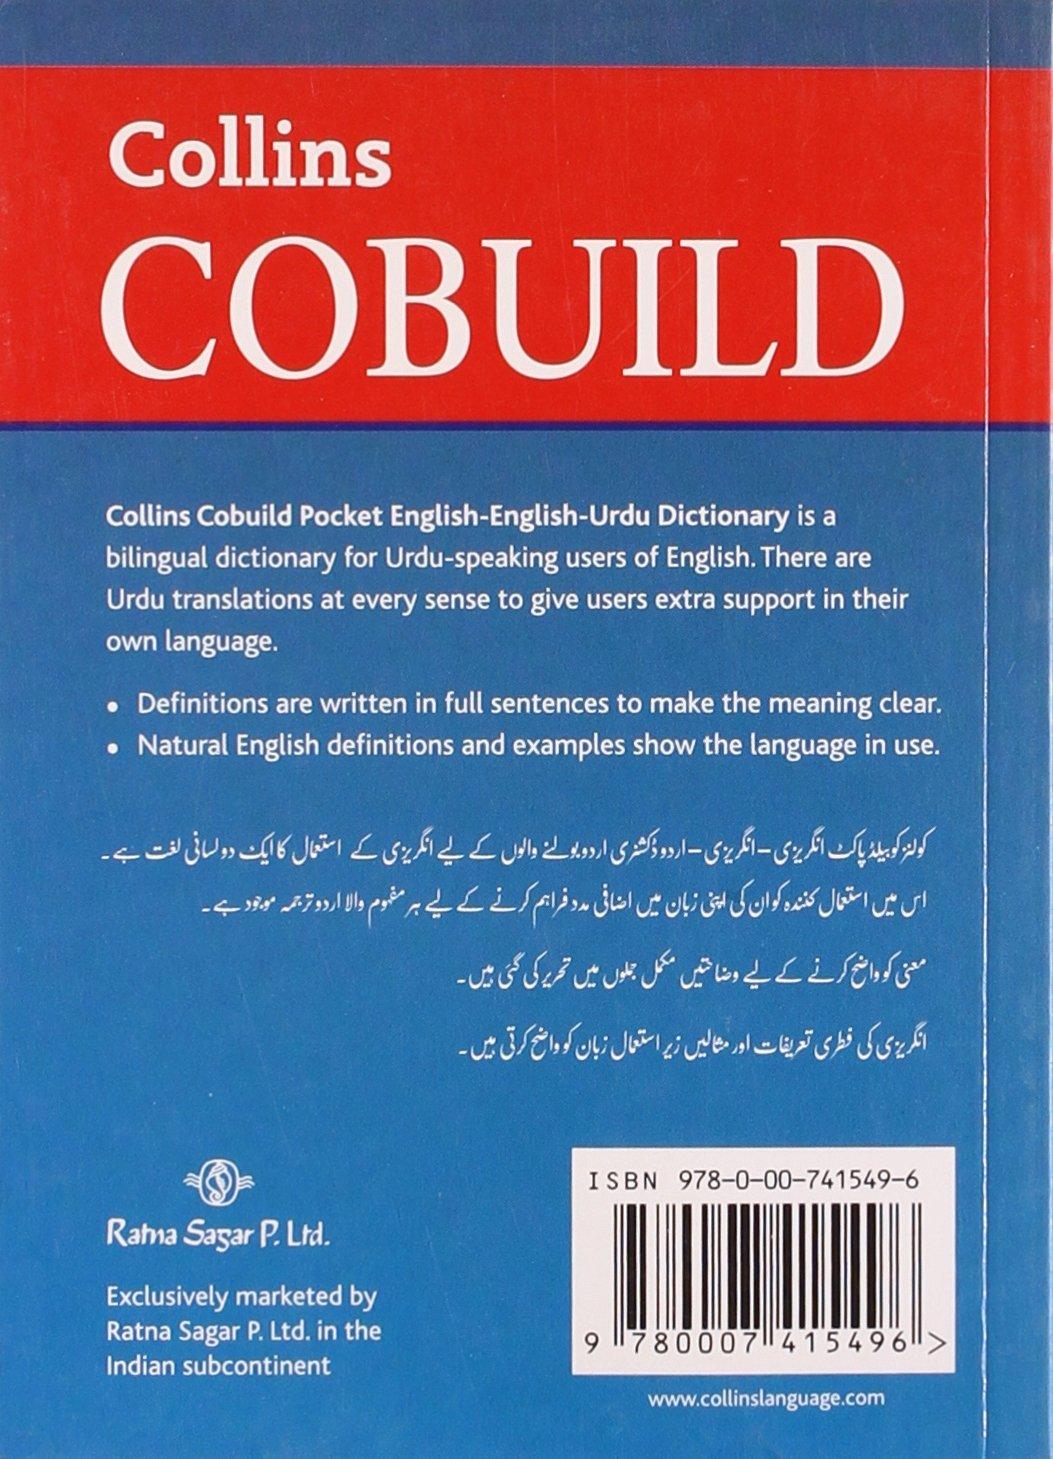 Buy Collins Cobuild Pocket English-English-Urdu Dictionary